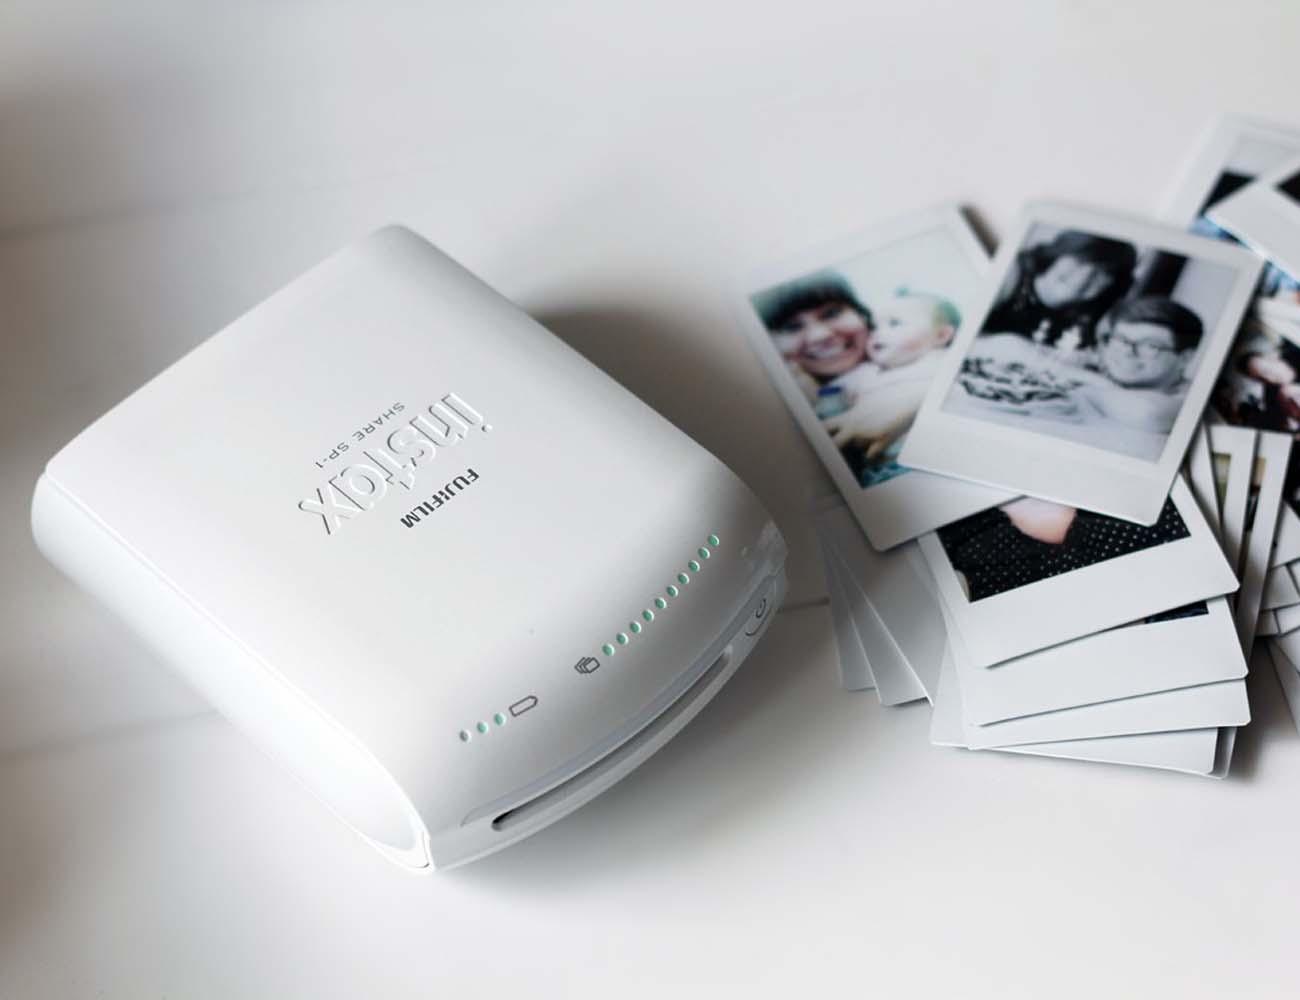 Instant bluetooth photo printer Polaroid Zip Instant Mobile Printer m